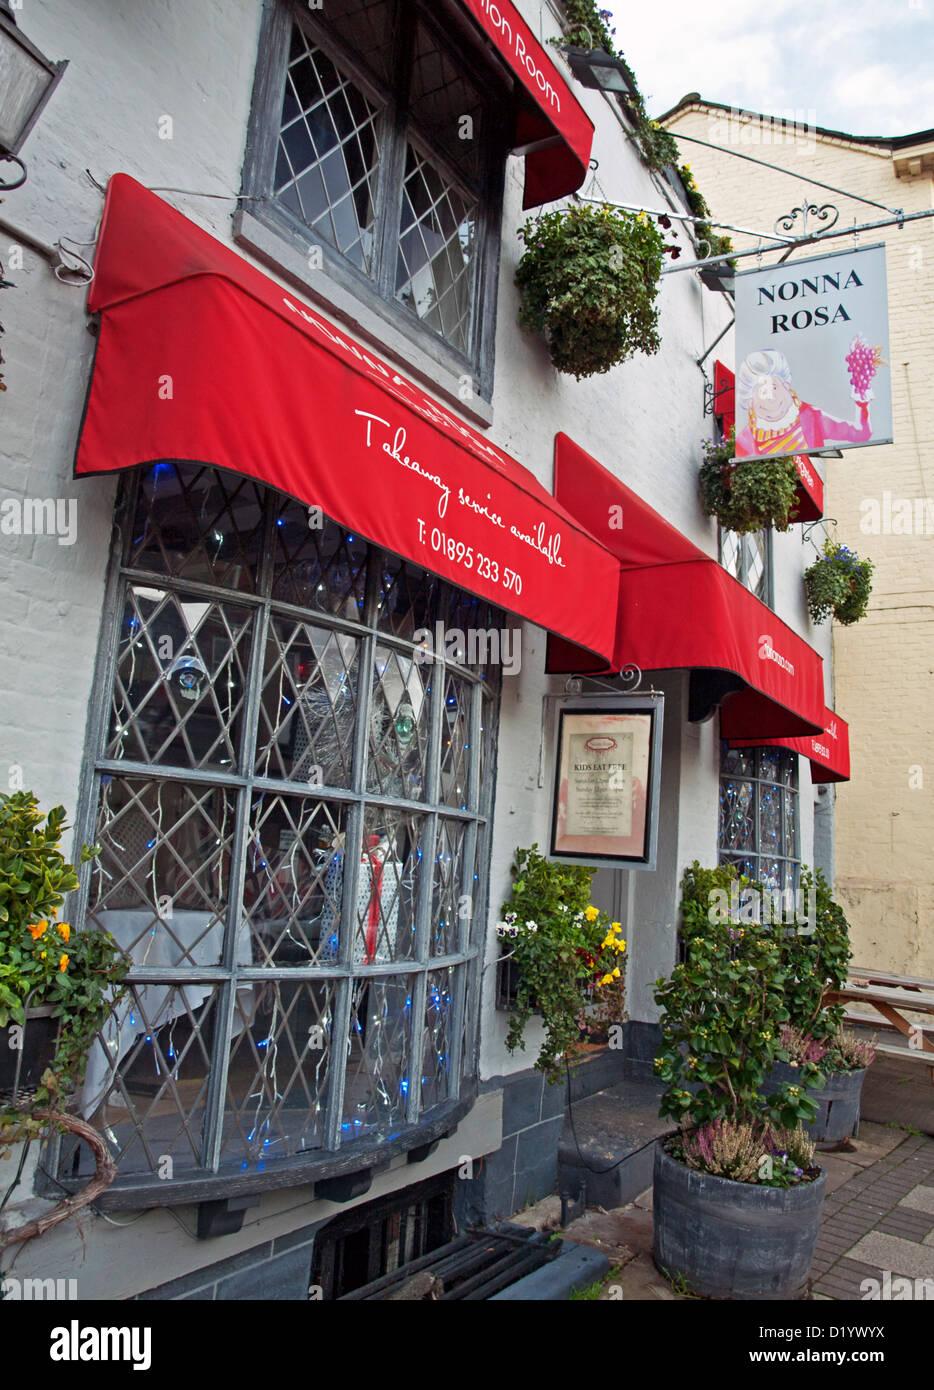 Italian restaurant exterior - Exterior Of Italian Restaurant High Street Uxbridge Middlesex England United Kingdom